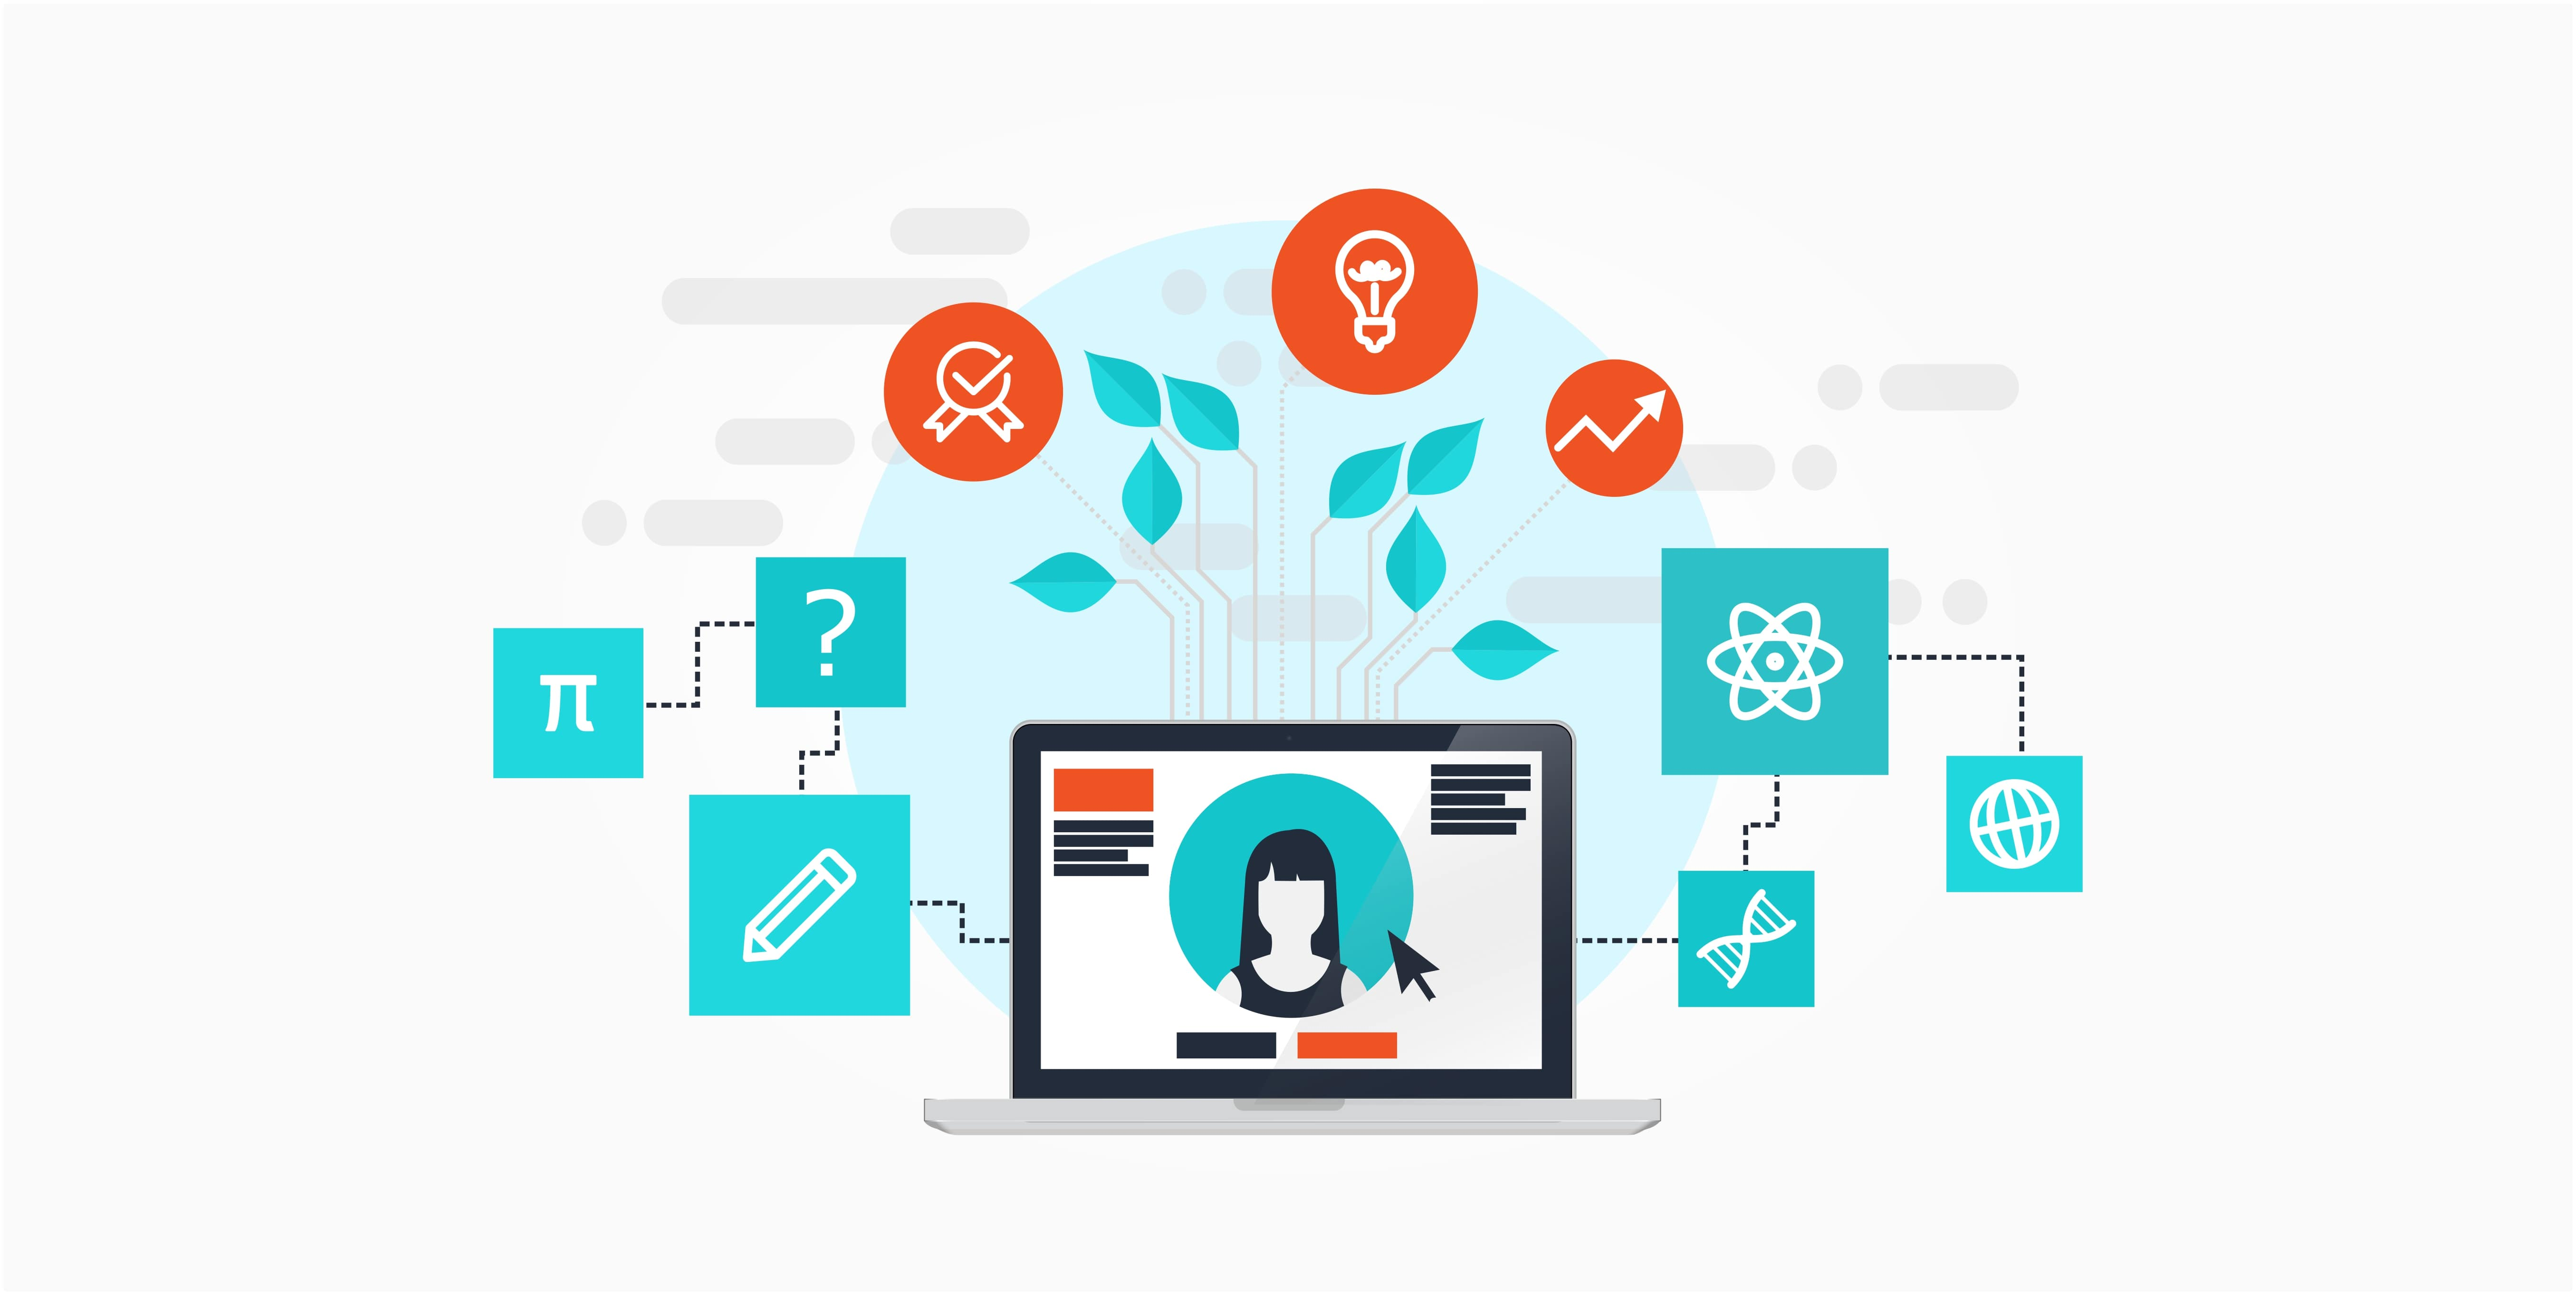 Replay Webinar : Comment optimiser votre prospection en ligne et booster vos ventes ?